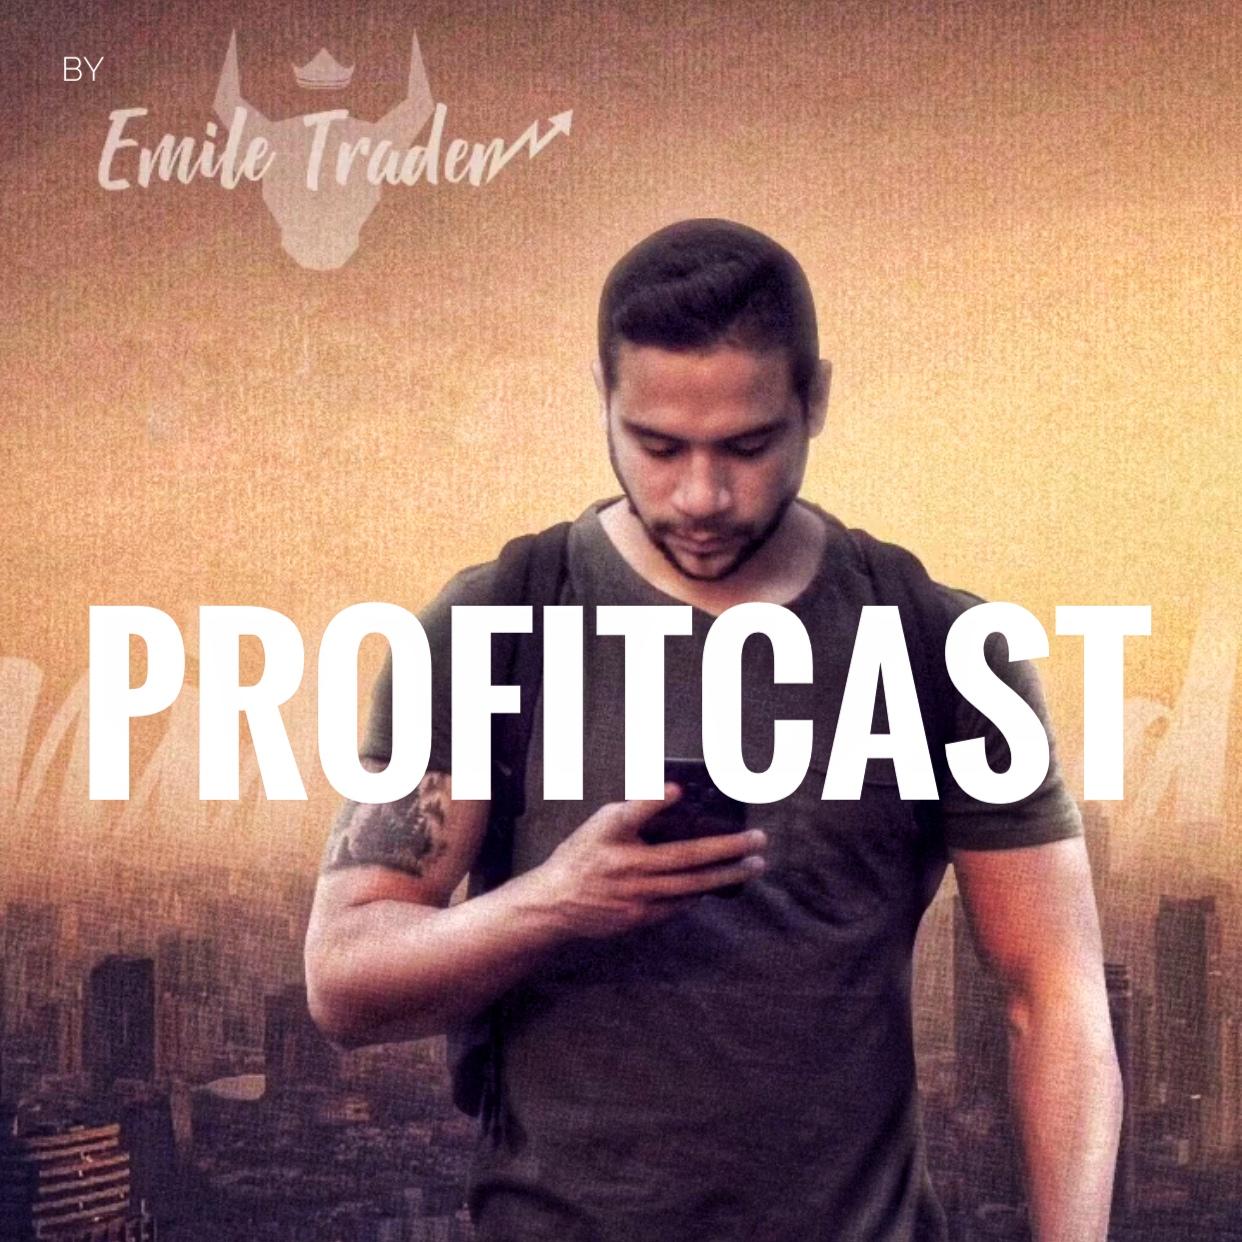 Profitcast4life's podcast show art